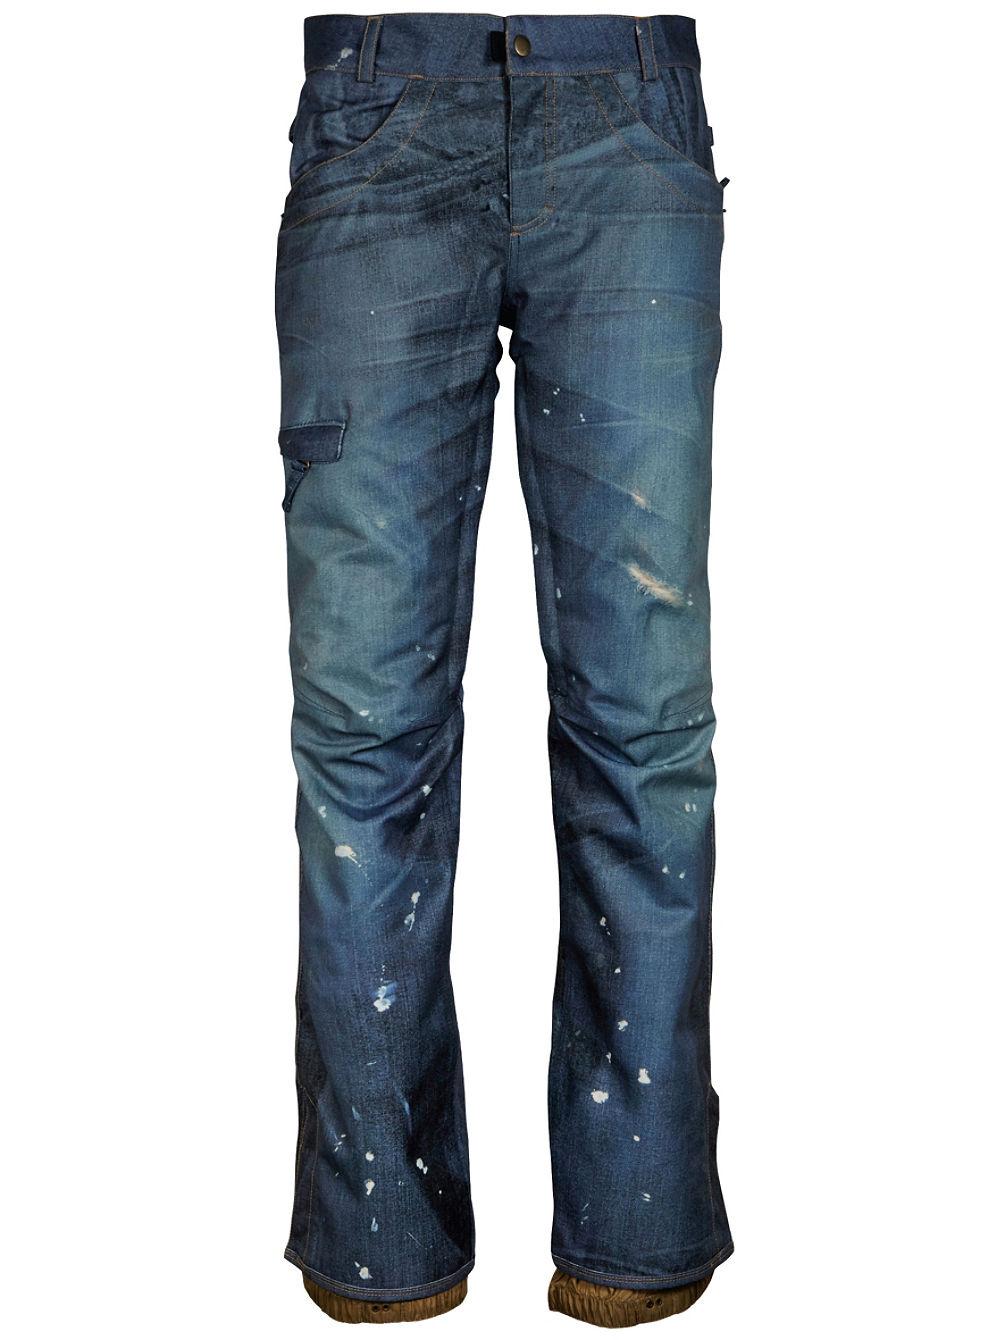 0b6da713 Buy 686 Deconstructd Denim Insulator Pants online at blue-tomato.com